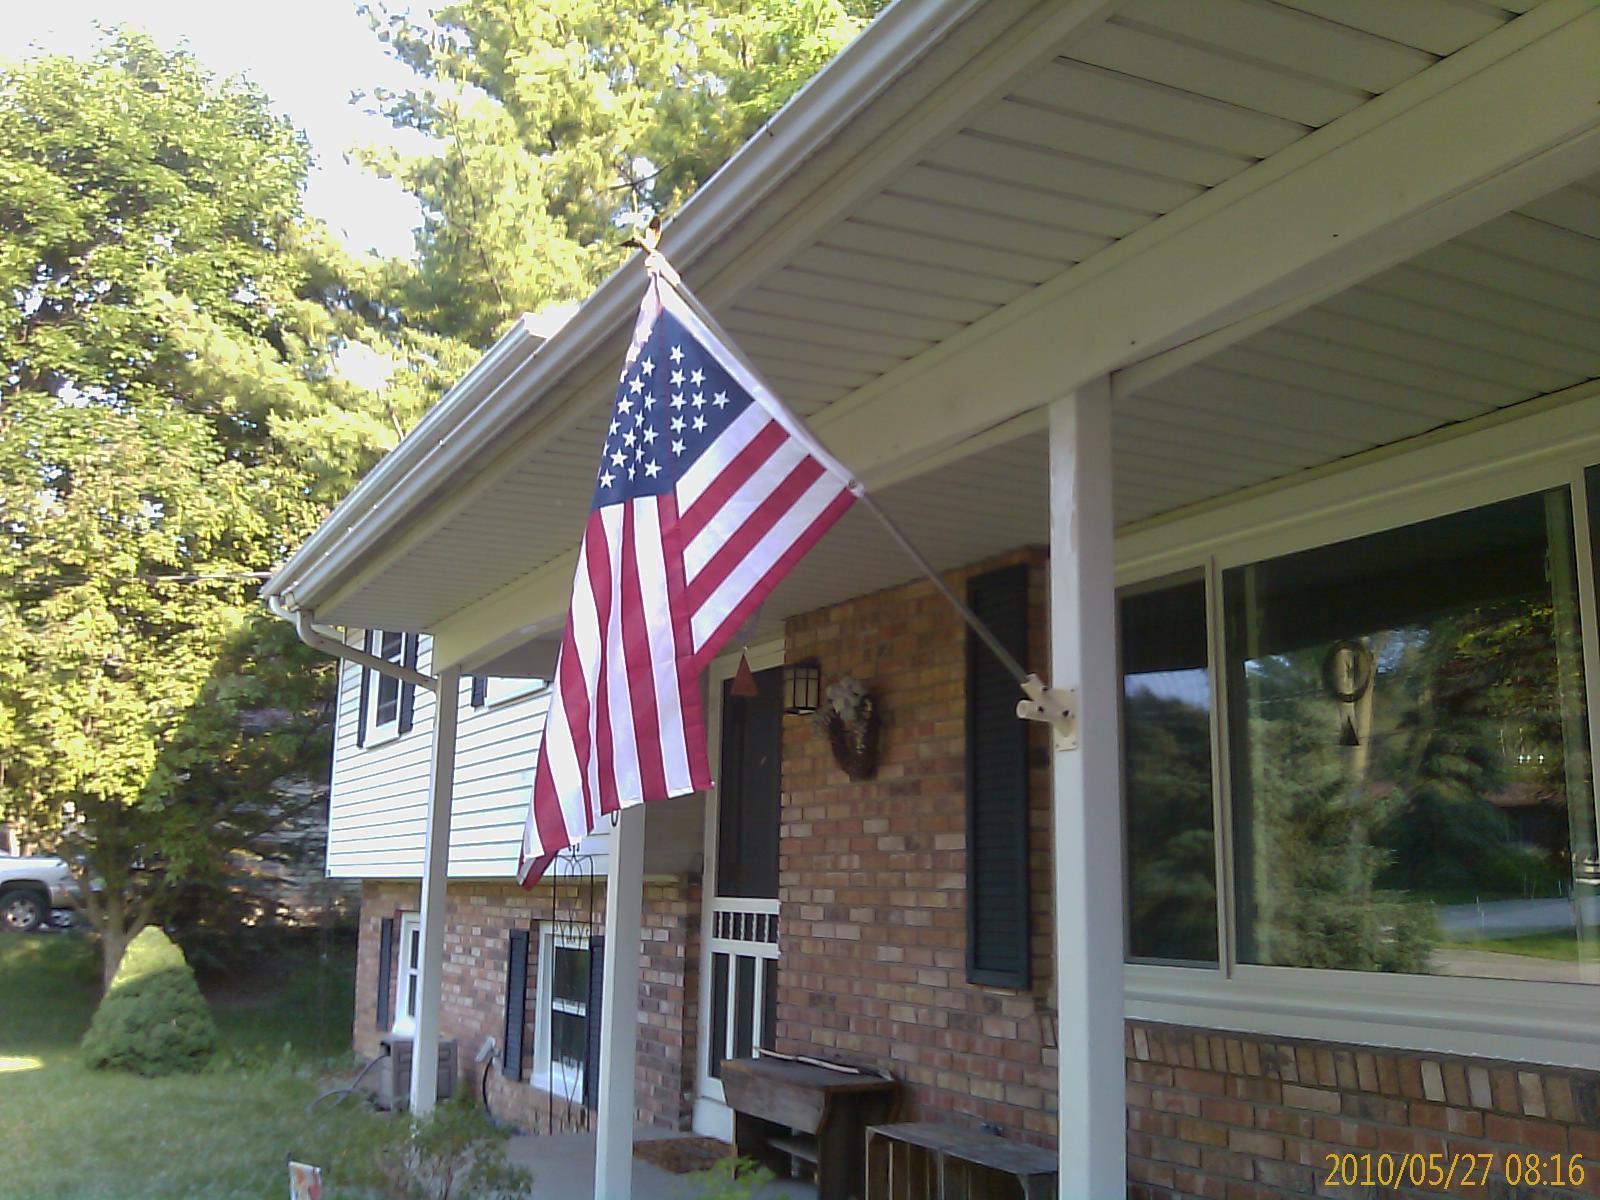 wonderful flag for house #5: Advertisements